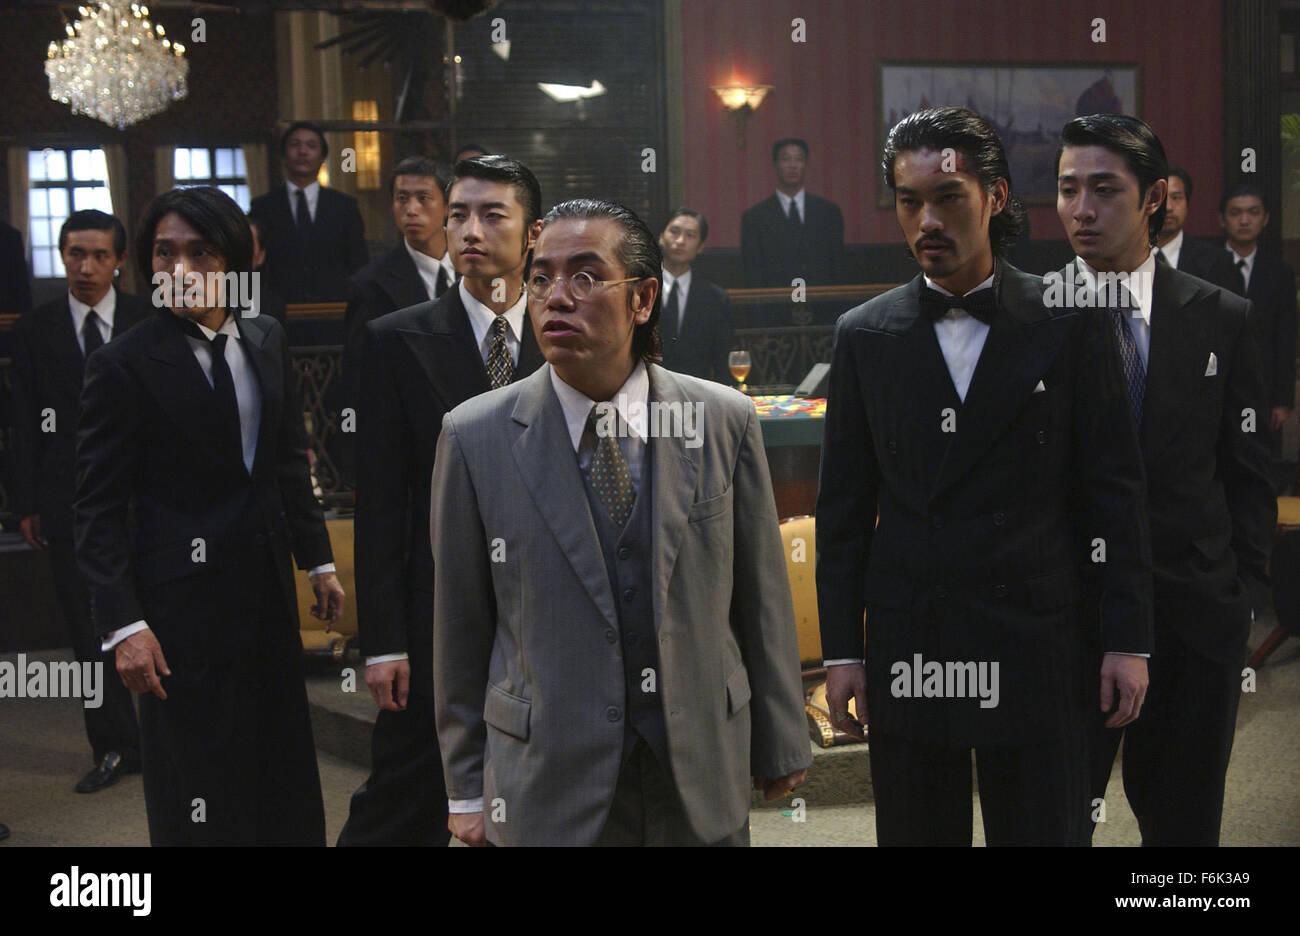 release date april 22 2005 movie title kung fu hustle